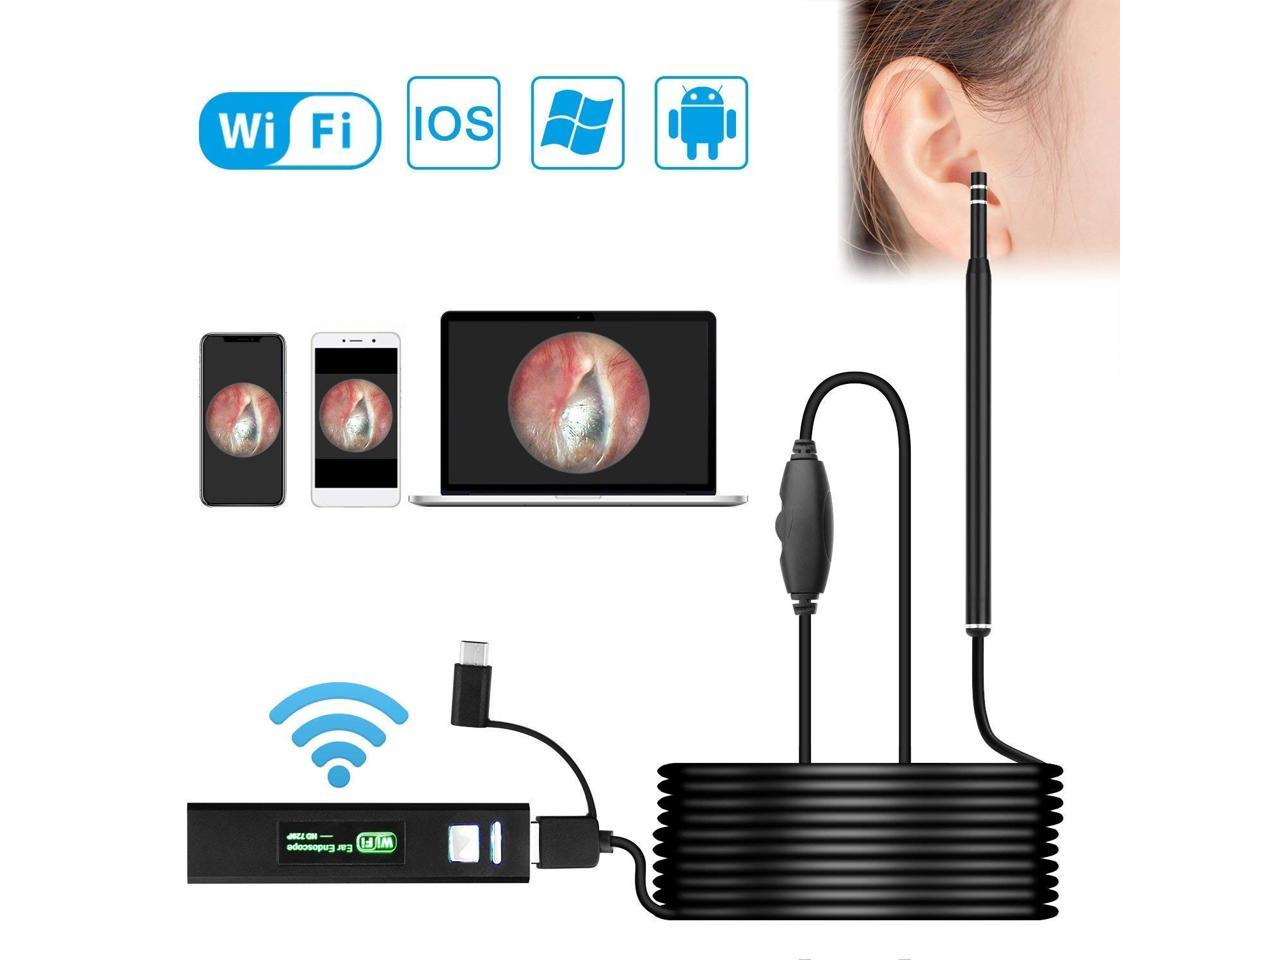 PRO HD Ear Scoop Endoscope Set Ear Wax Cleaner Otoscope Camera 1.3MP Cam Kit